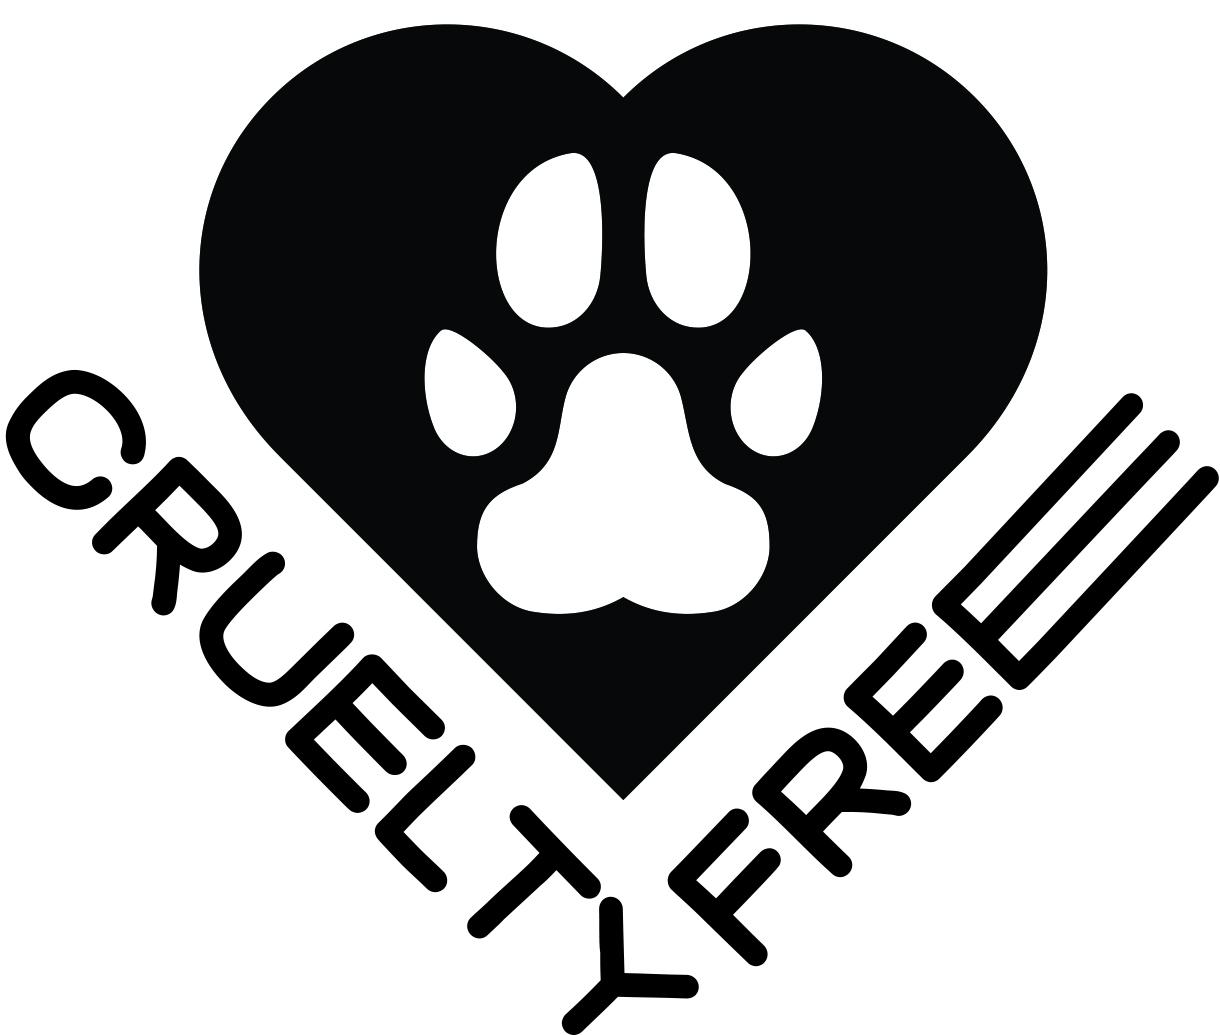 MALIBU-CRUELTY-FREE-black.jpg